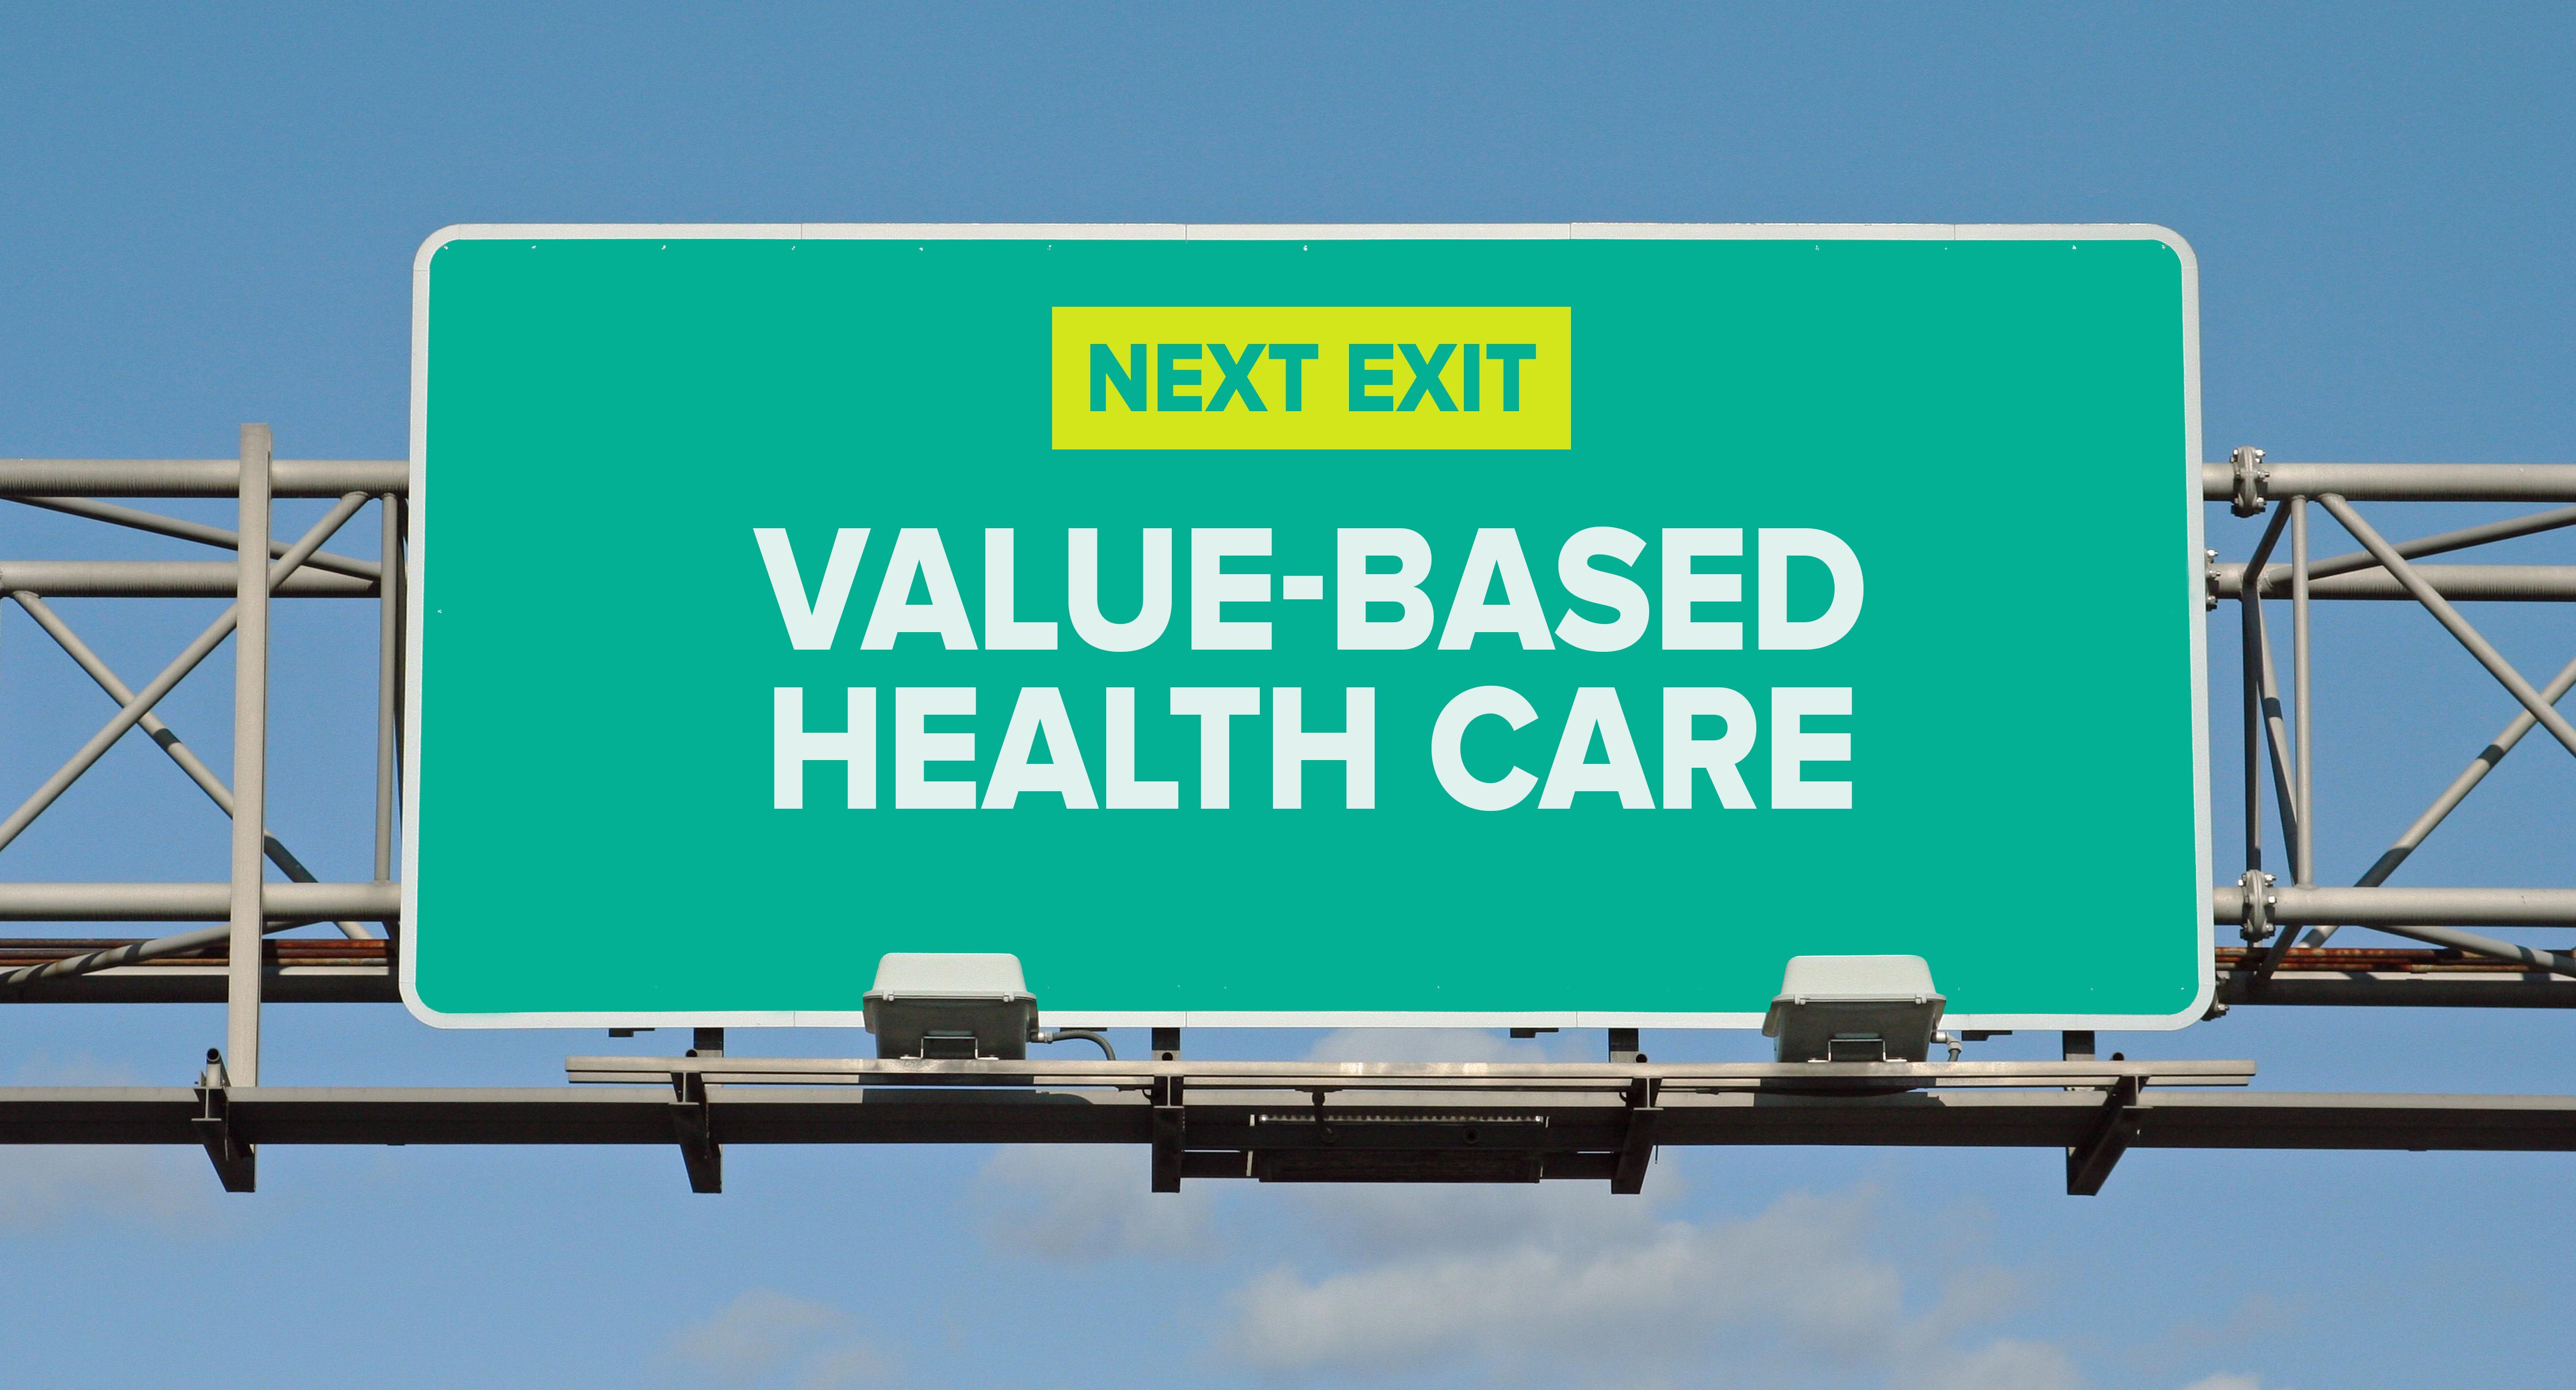 Value-Based_Health_Care_Roadsign